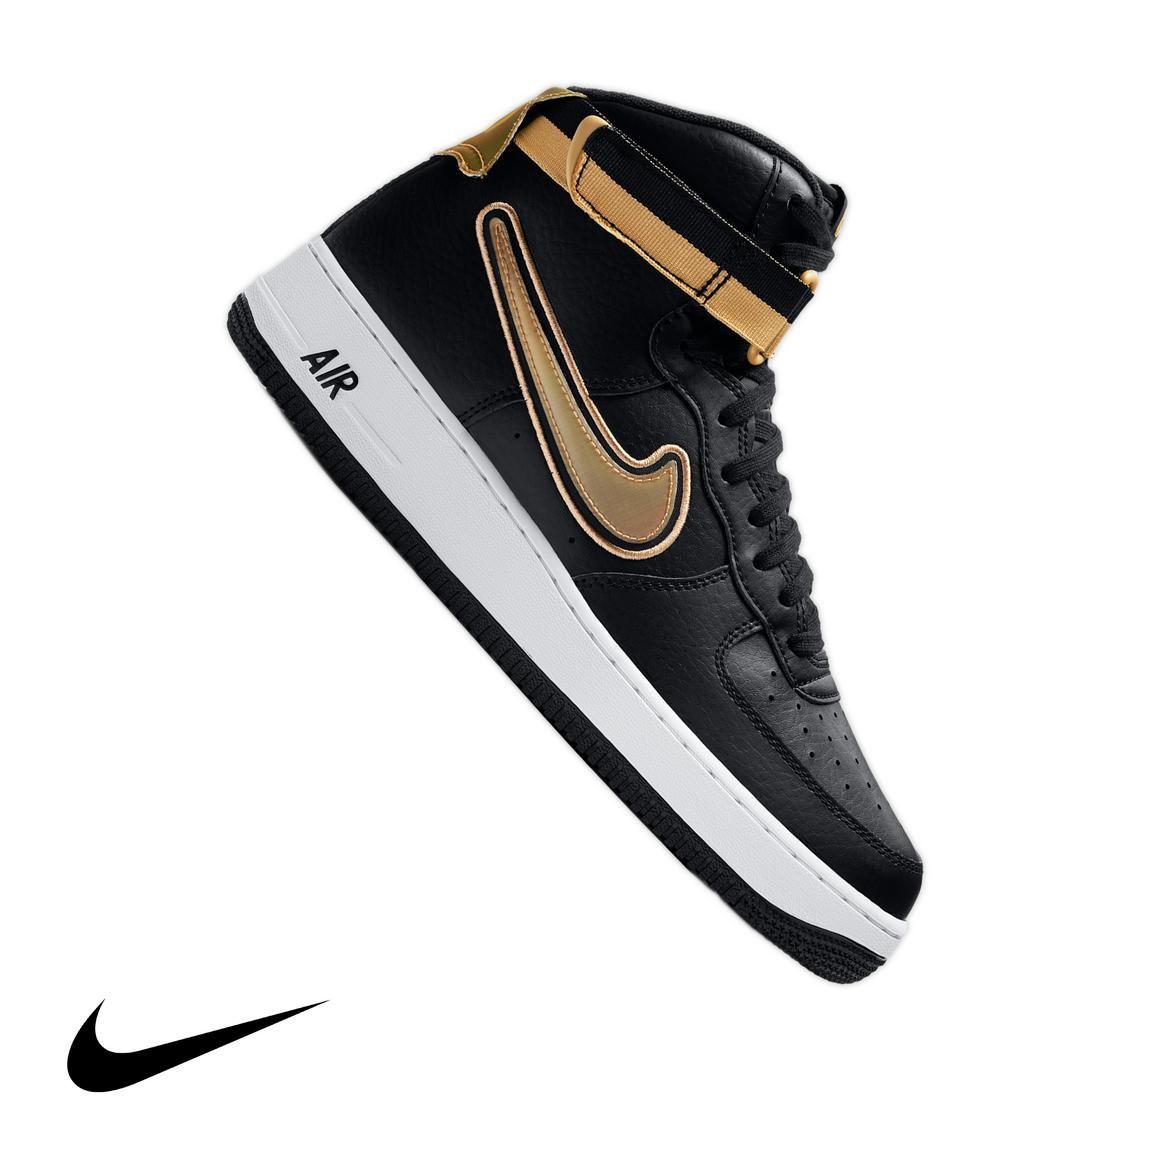 "Nike Air Force 1 High '07 LV8 Sport ""Black/Gold"" Men's"